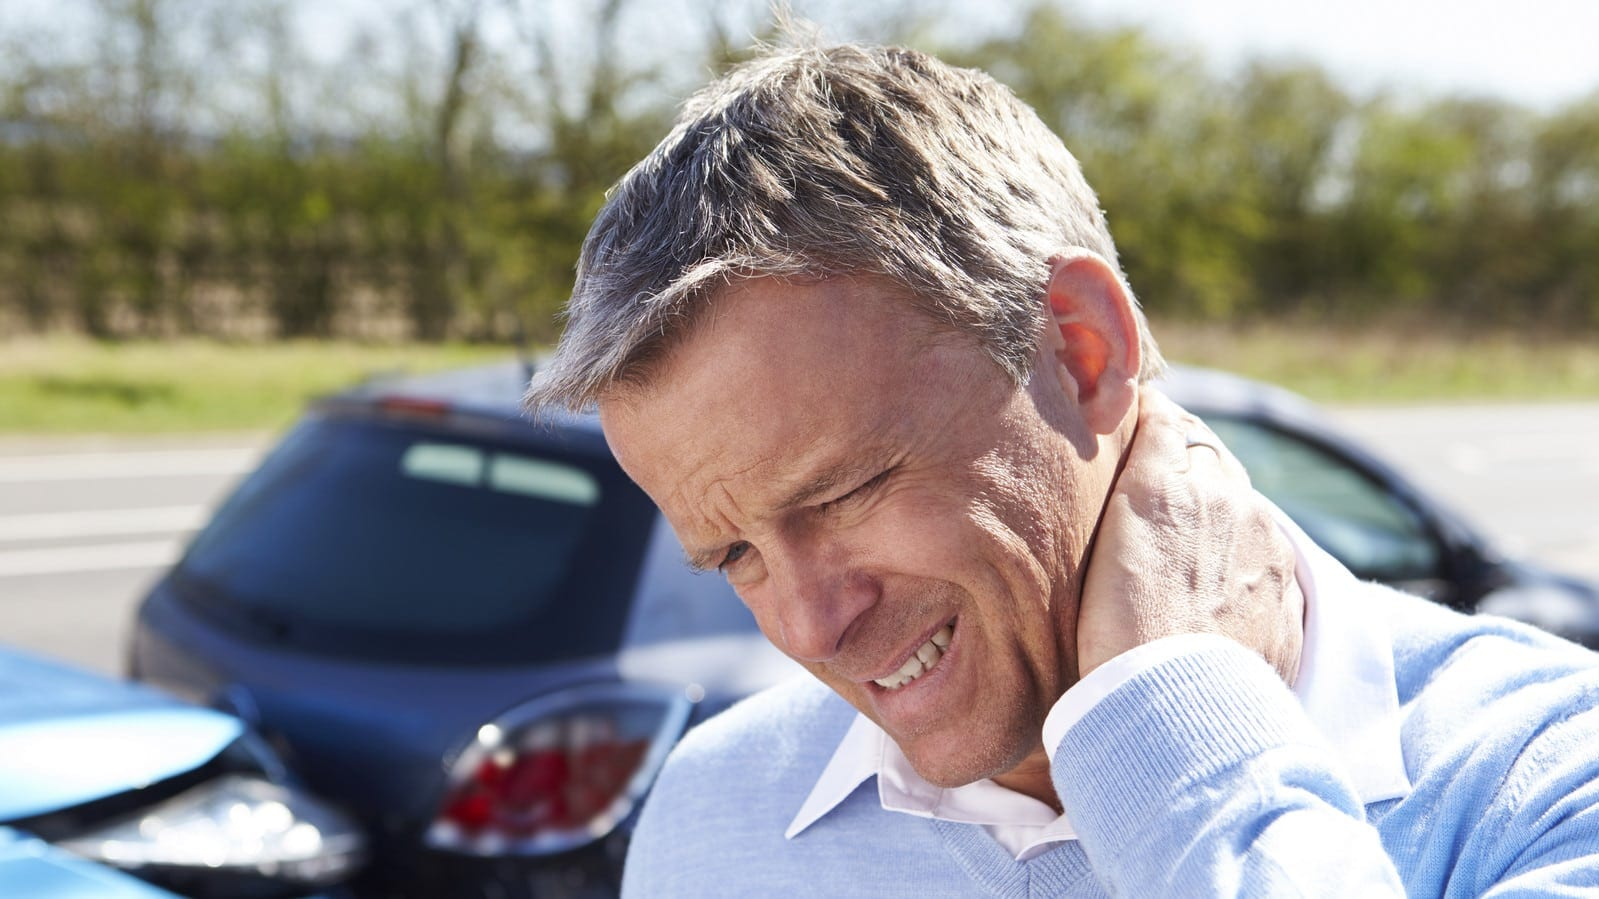 Man With A Whiplash Injury Stock Photo